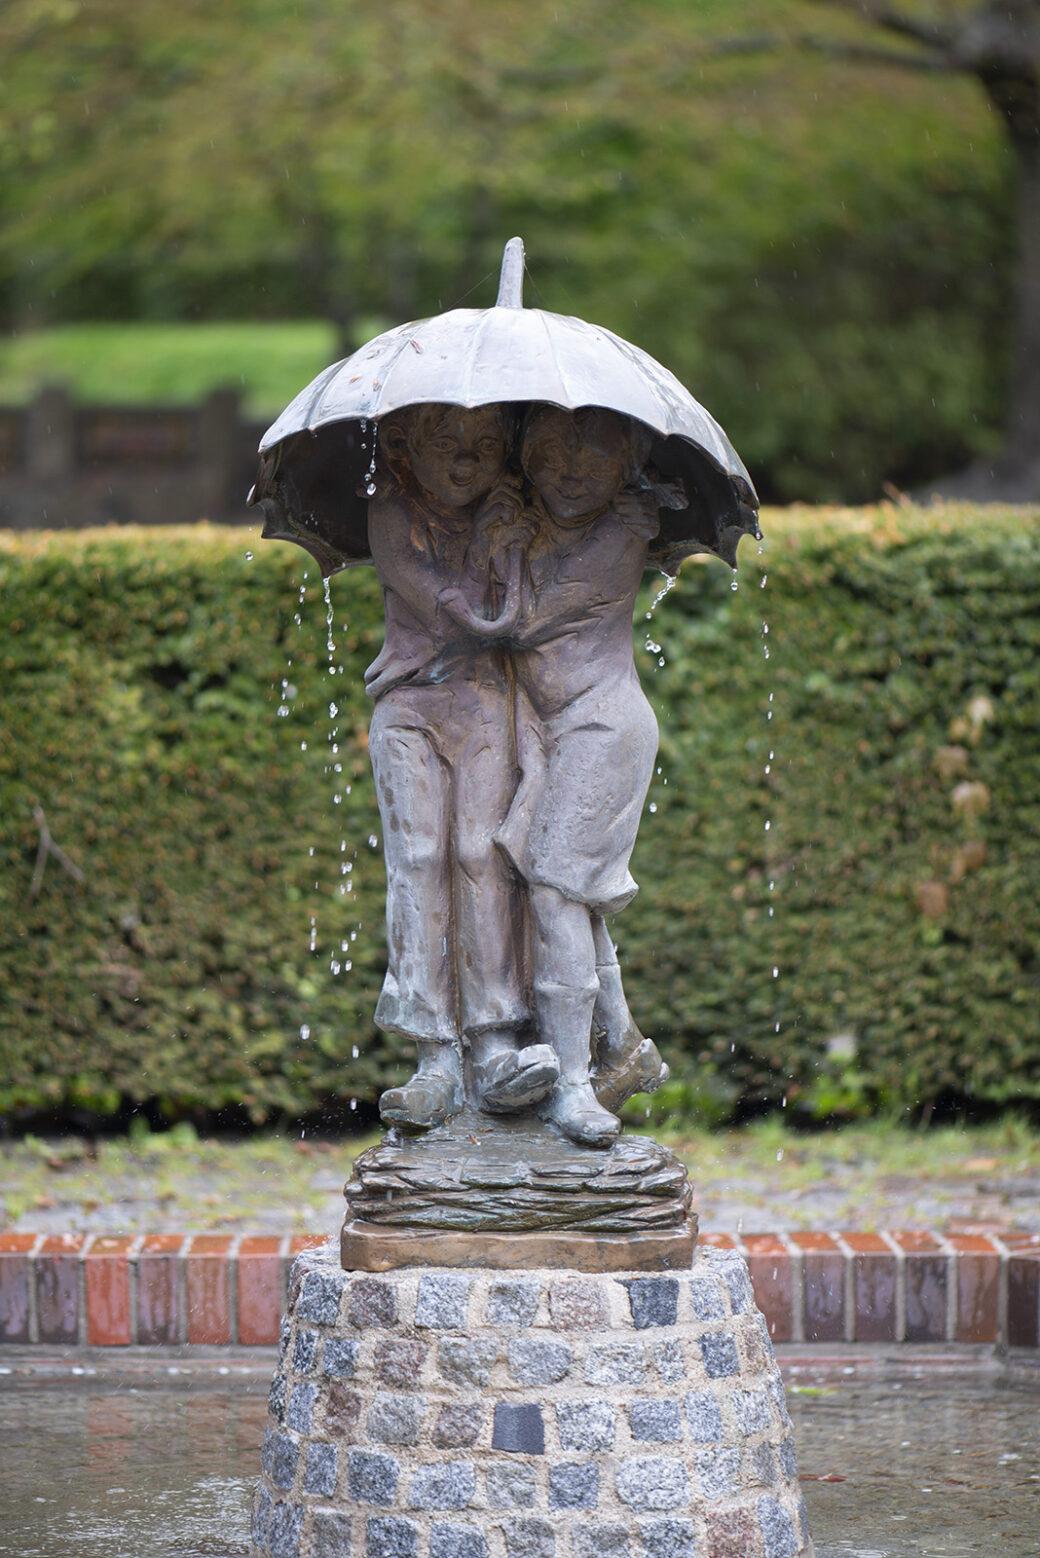 Kinder im Regen (Foto: KUNST@SH/Jan Petersen, 2021)